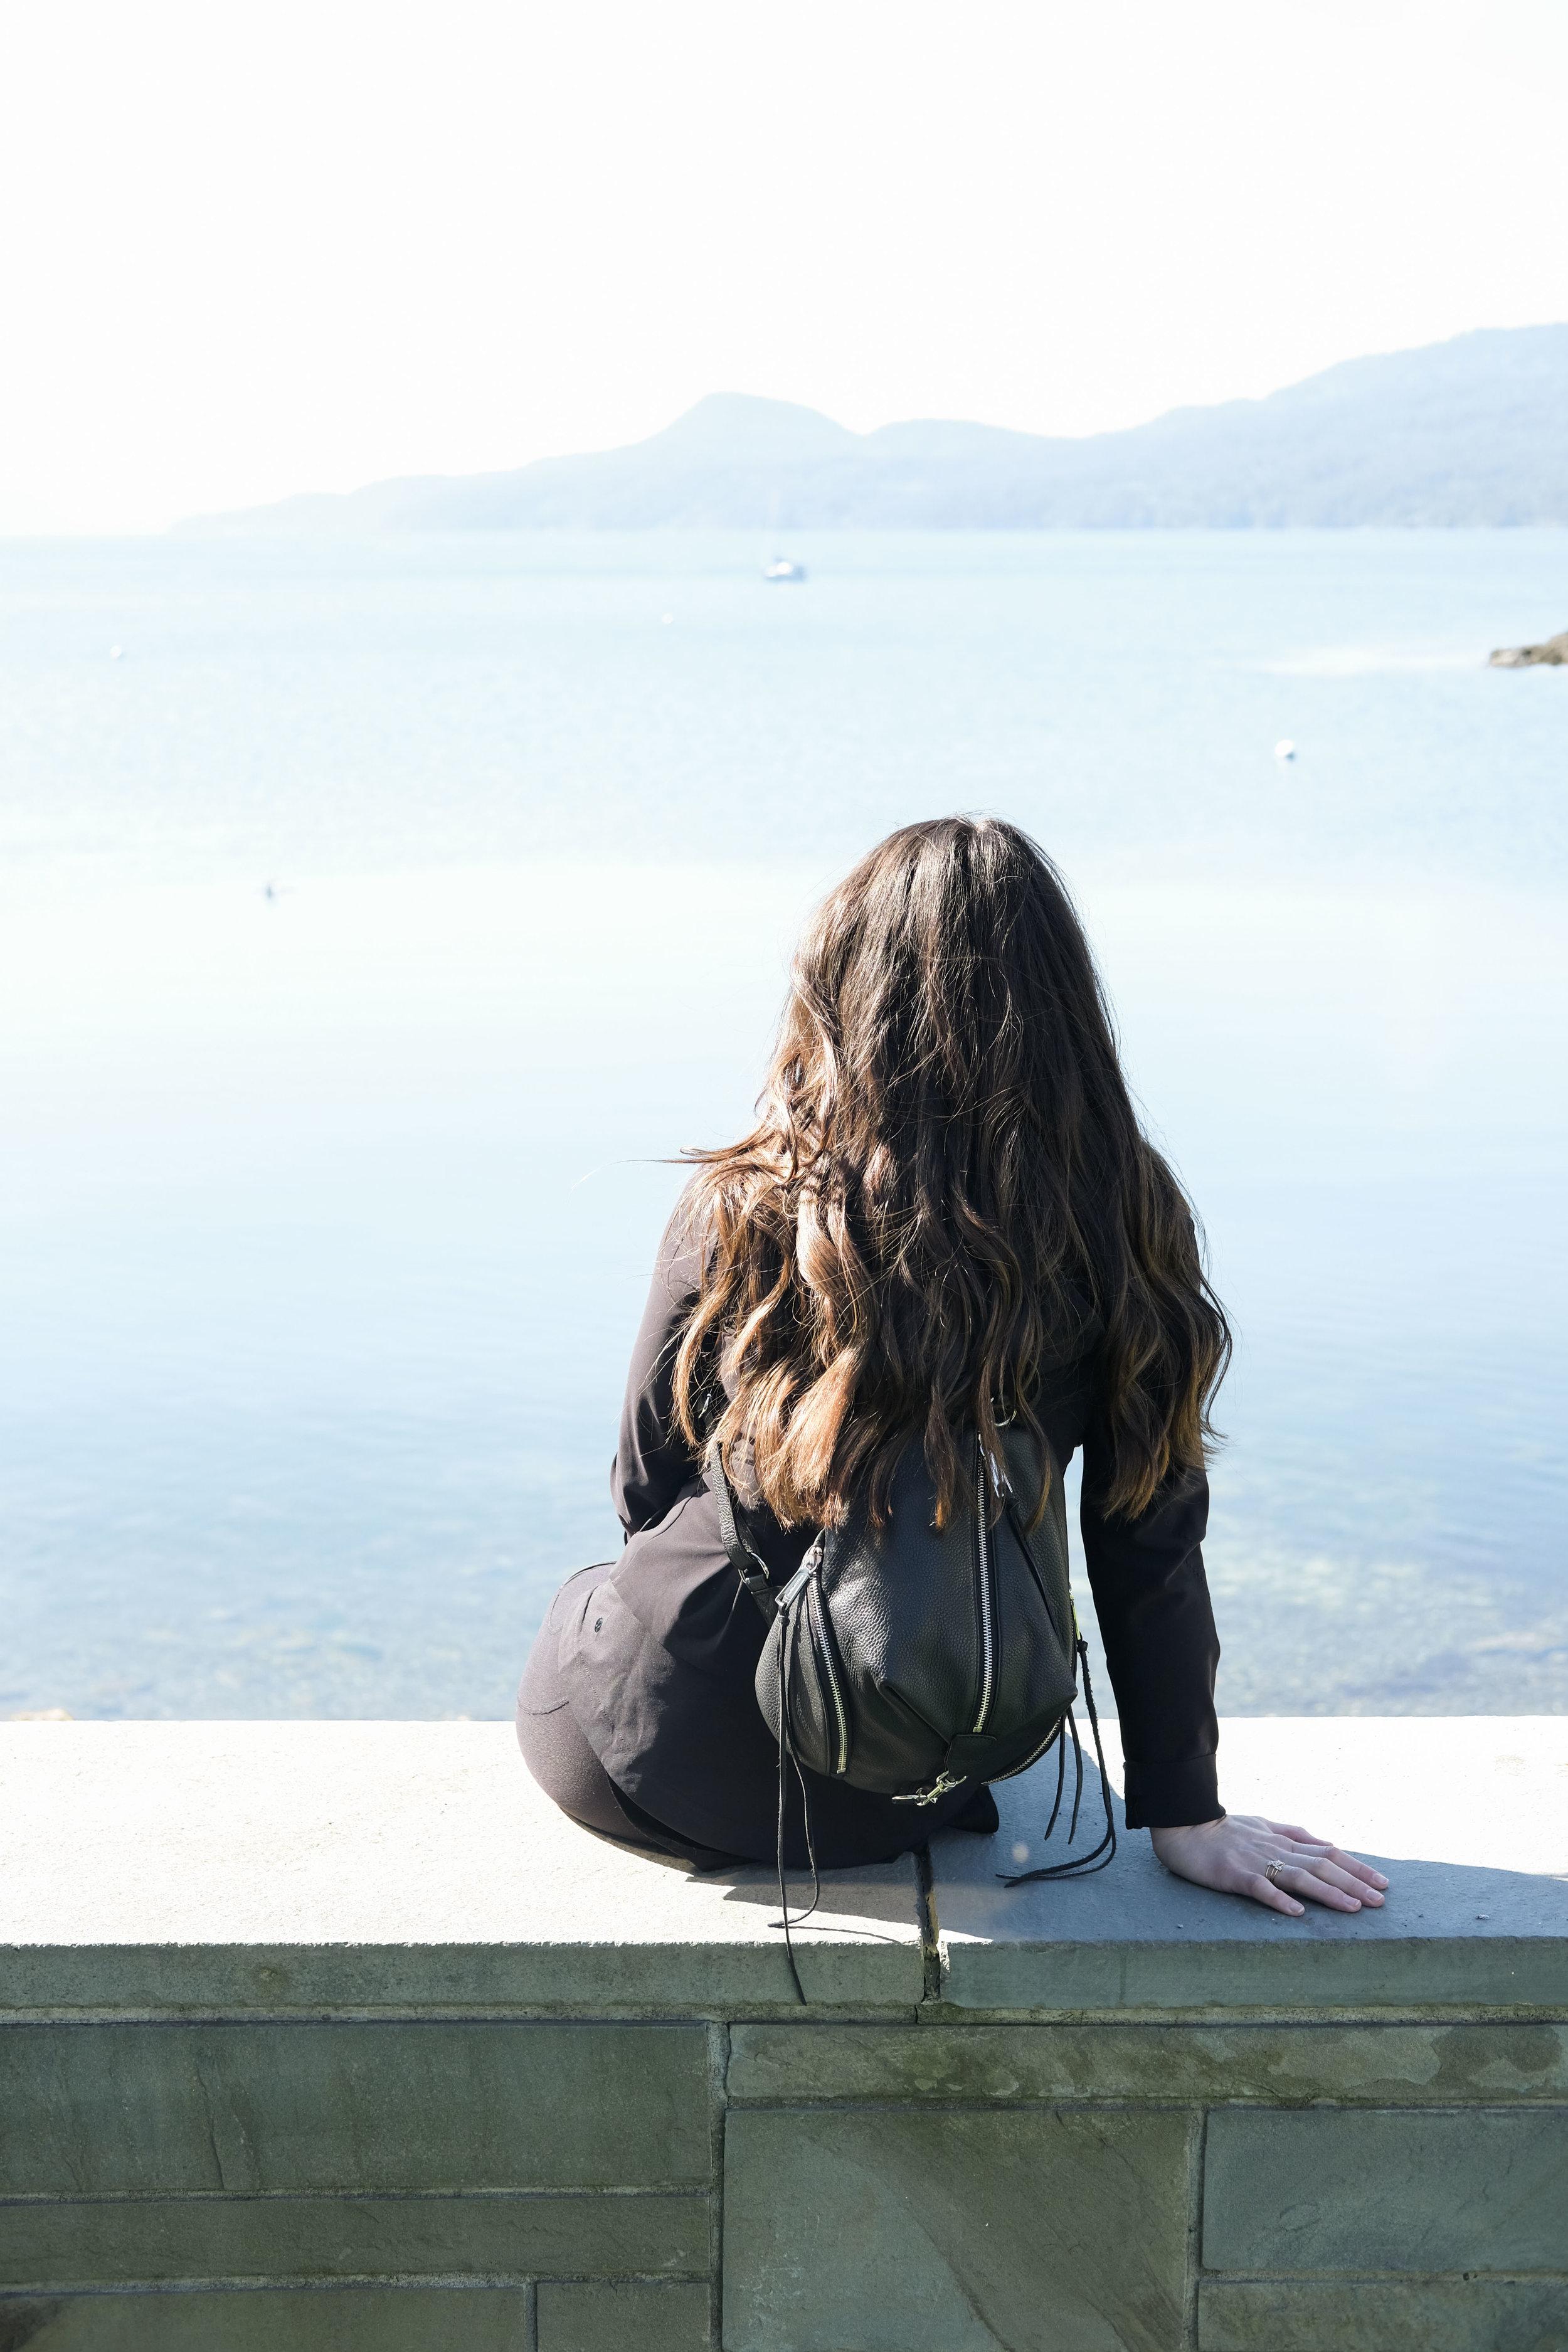 san juan islands washington_orcas island travel guide_what to do where to stay in san juan islands washington_rebecca minkoff medium julian backpack_lululemon jacket_alo yoga moto pants_01.jpg